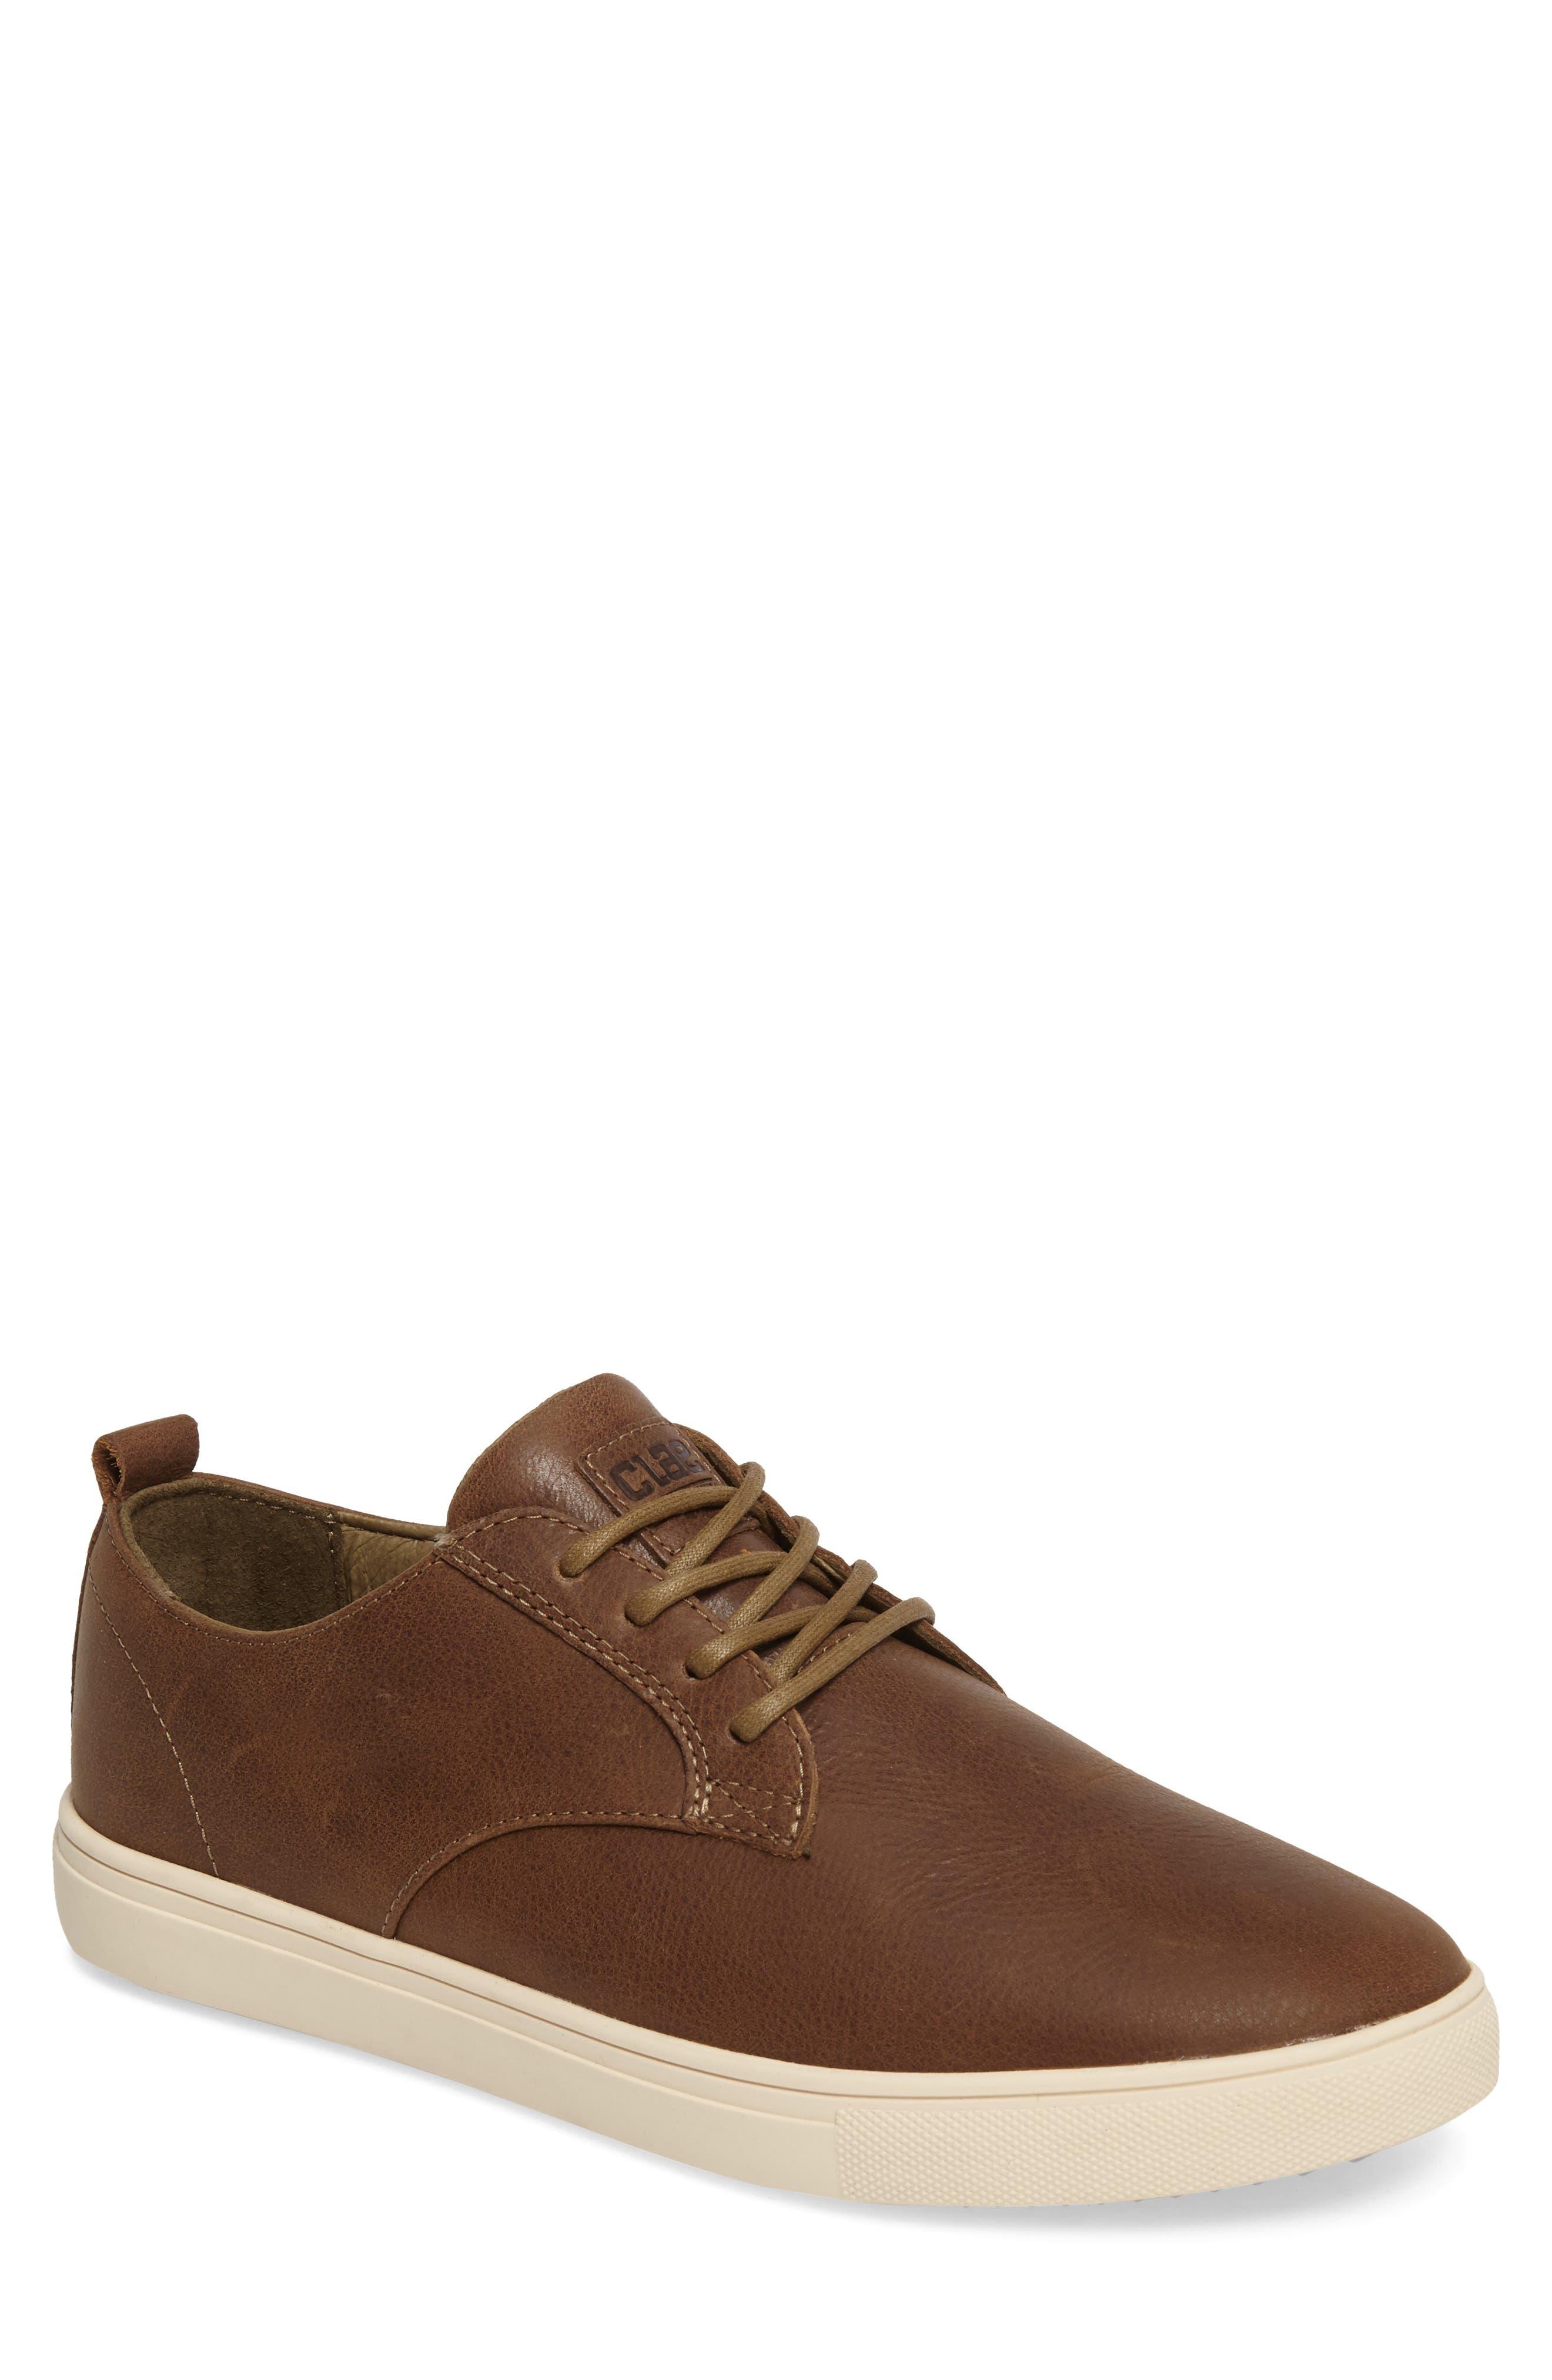 Alternate Image 1 Selected - Clae 'Ellington' Sneaker (Men)